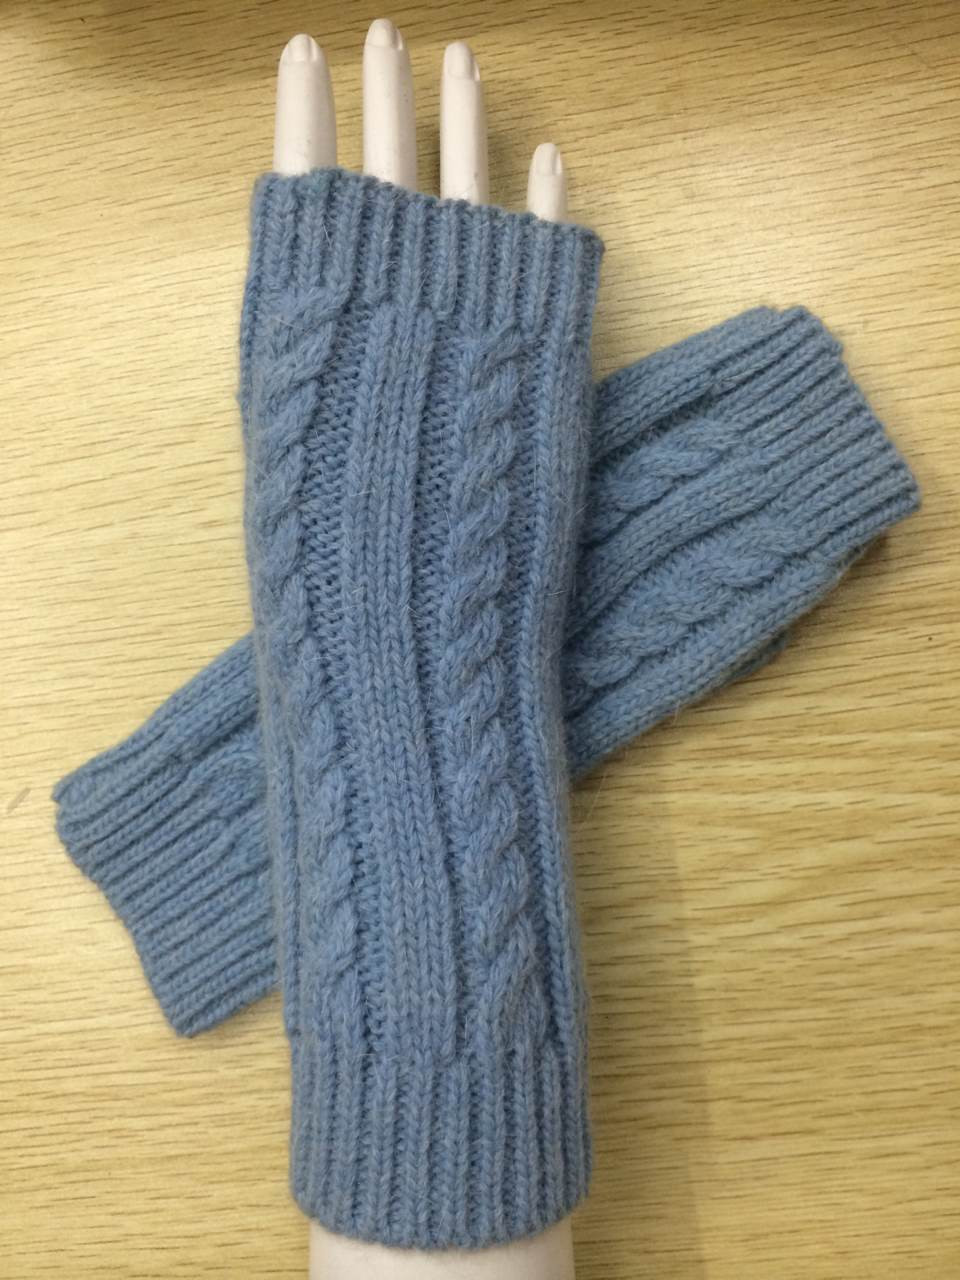 Solid Color Hand Knitted Women's Gloves Wrist Arm Warmer Winter Fingerless Mitten Dropship